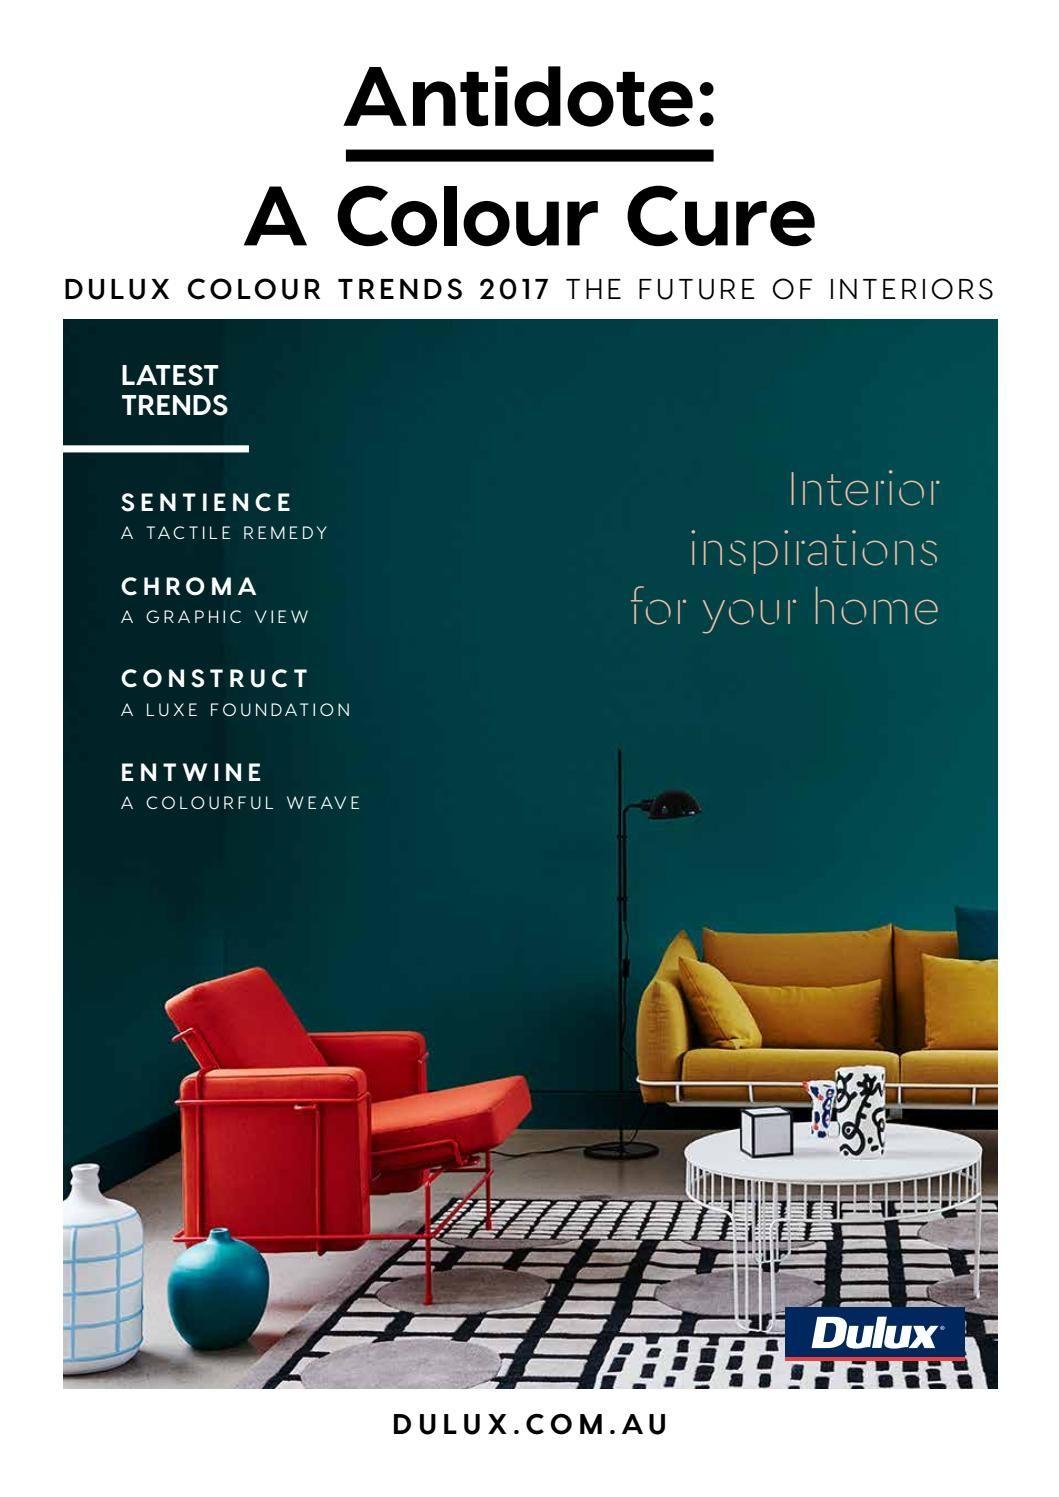 Dulux colour 2017 dulux colour trend dulux colour